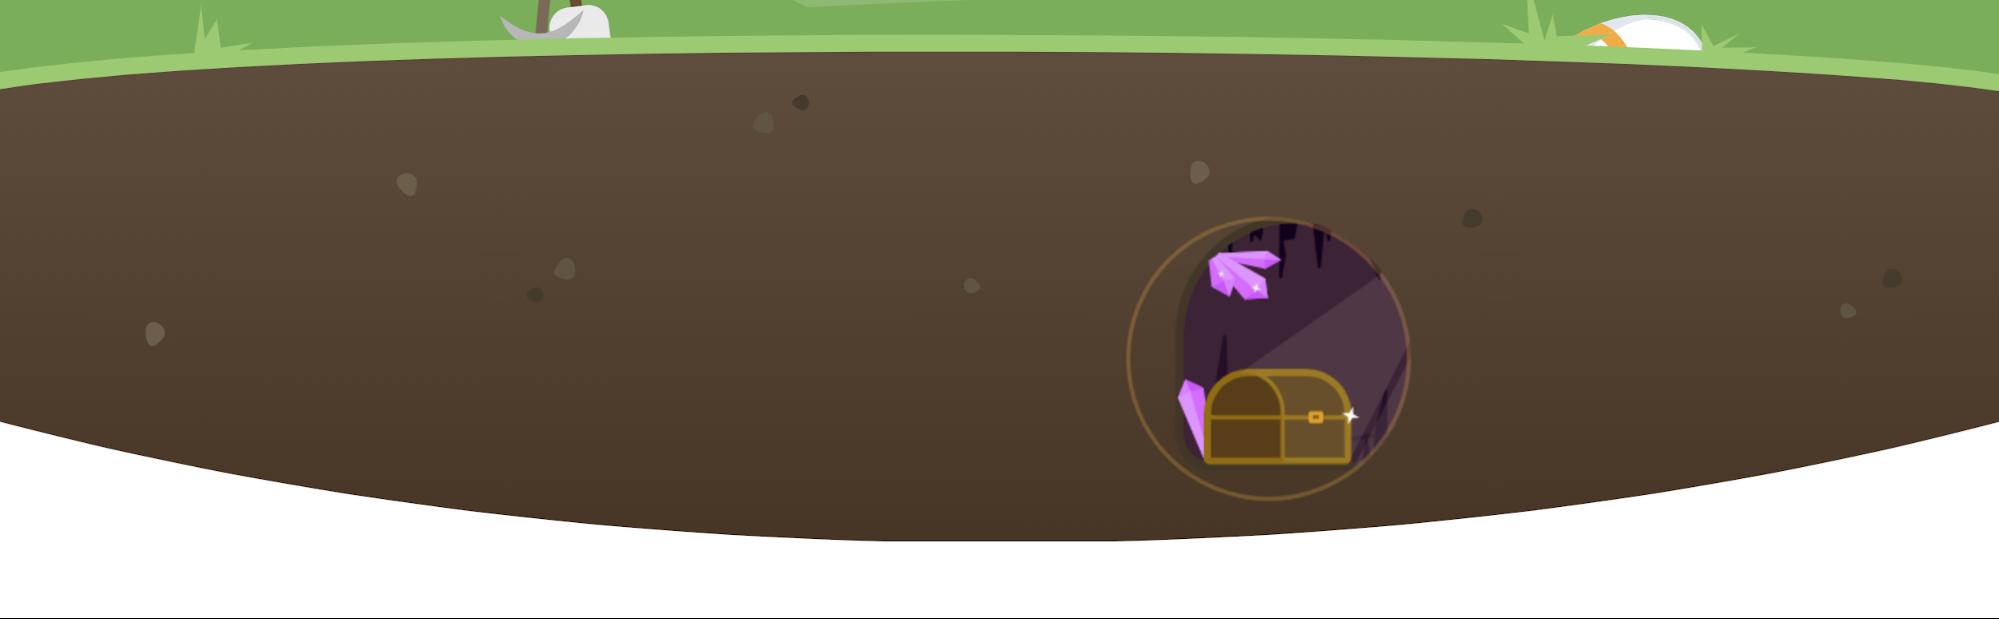 heat map example crazy egg